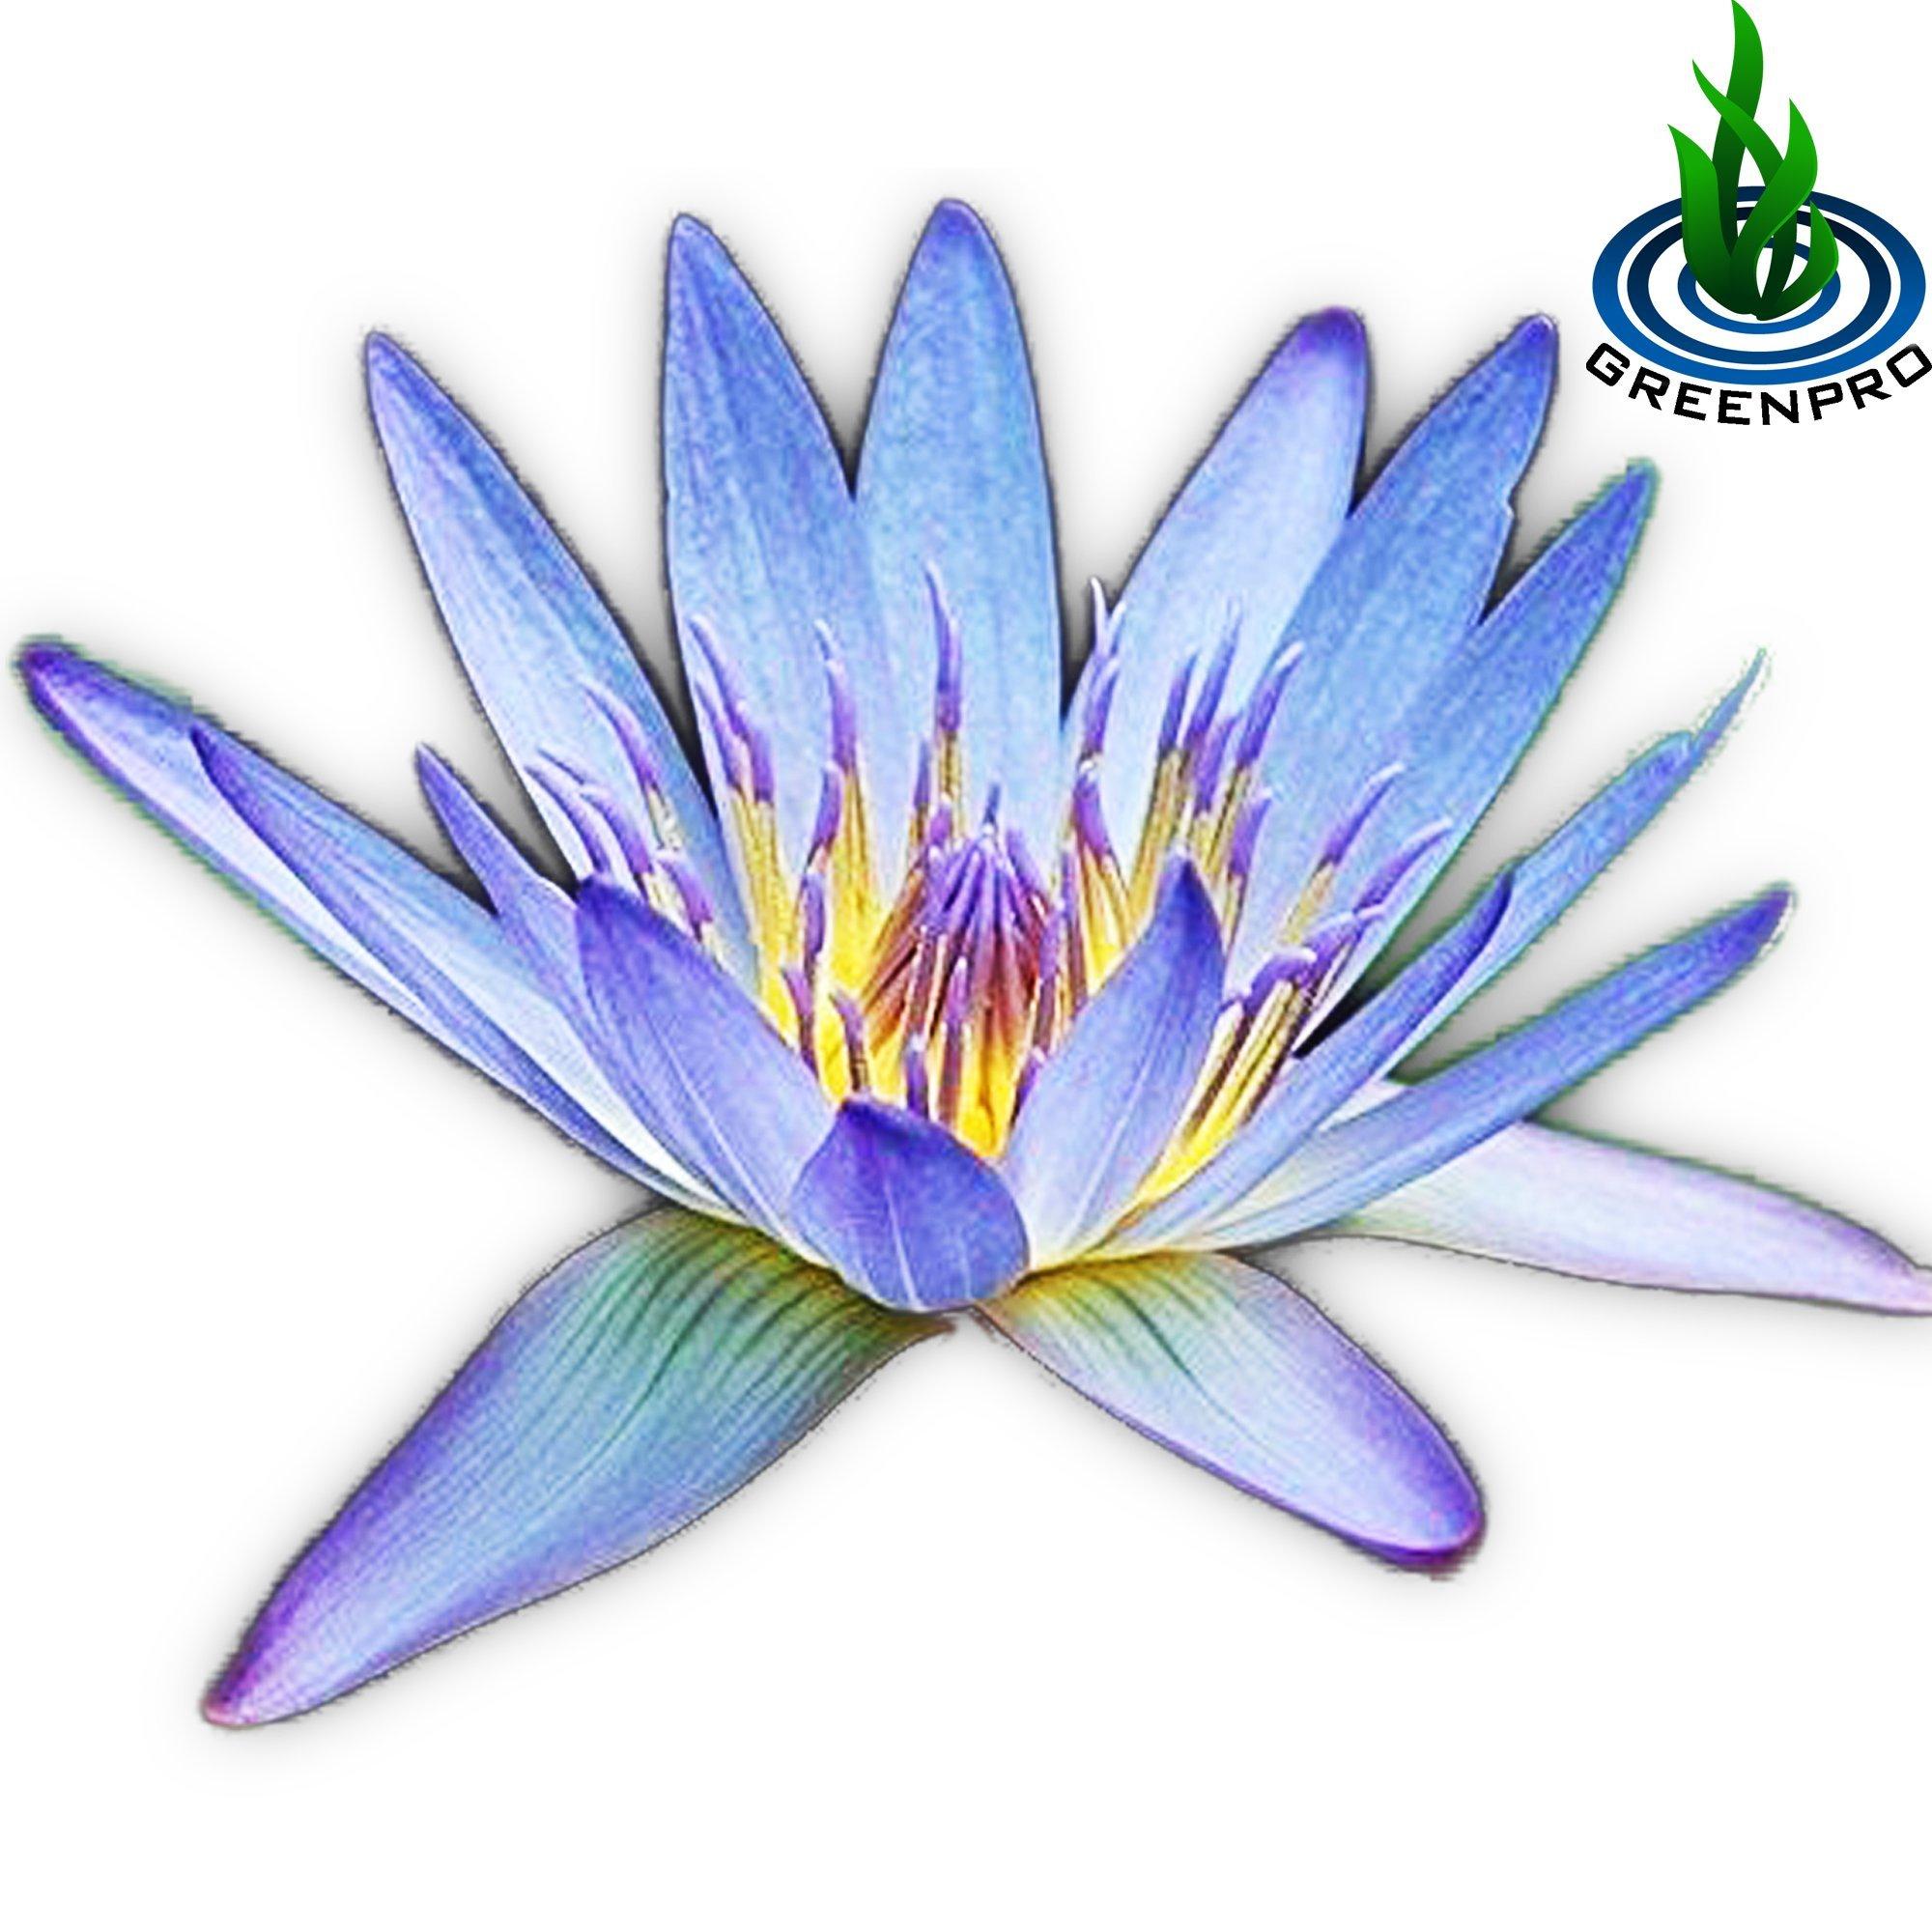 Live Aquatic Plant Nymphaea Geena Blue Tropical Water Lilies Tuber for Aquarium Freshwater Fish Pond by Greenpro